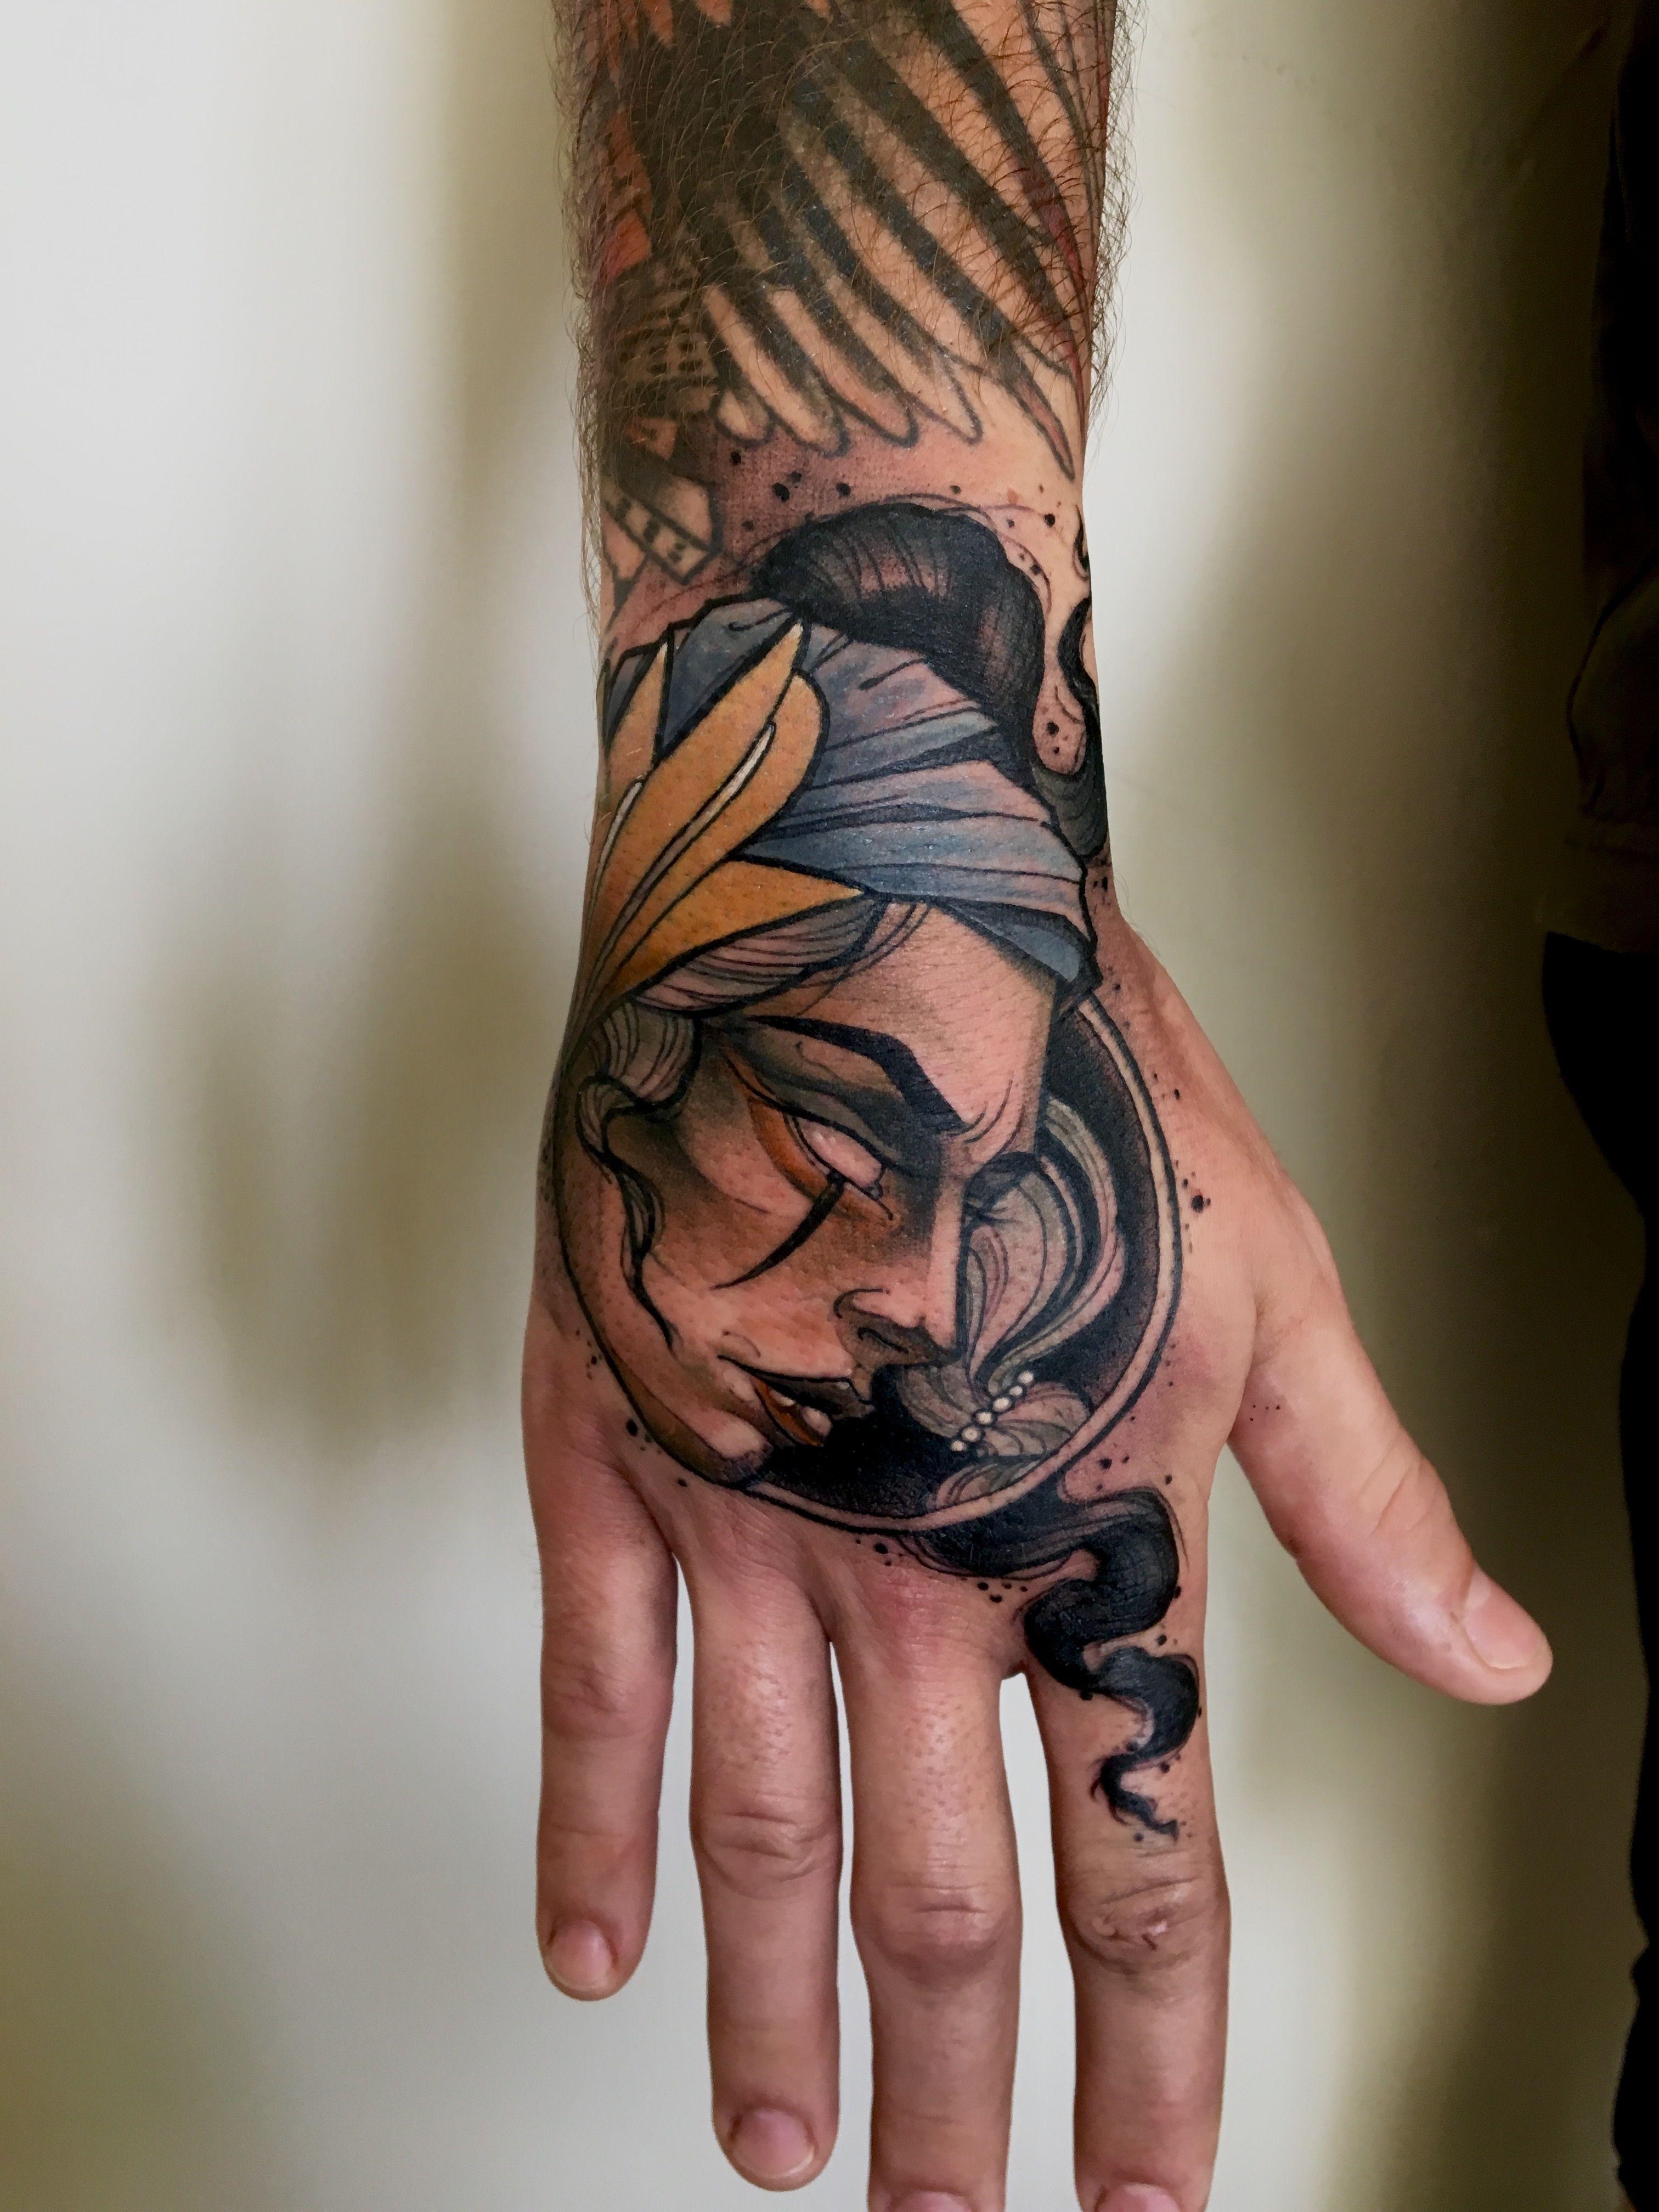 Female Face Hand Tattoo Done By Akostattoo Tattoos Female